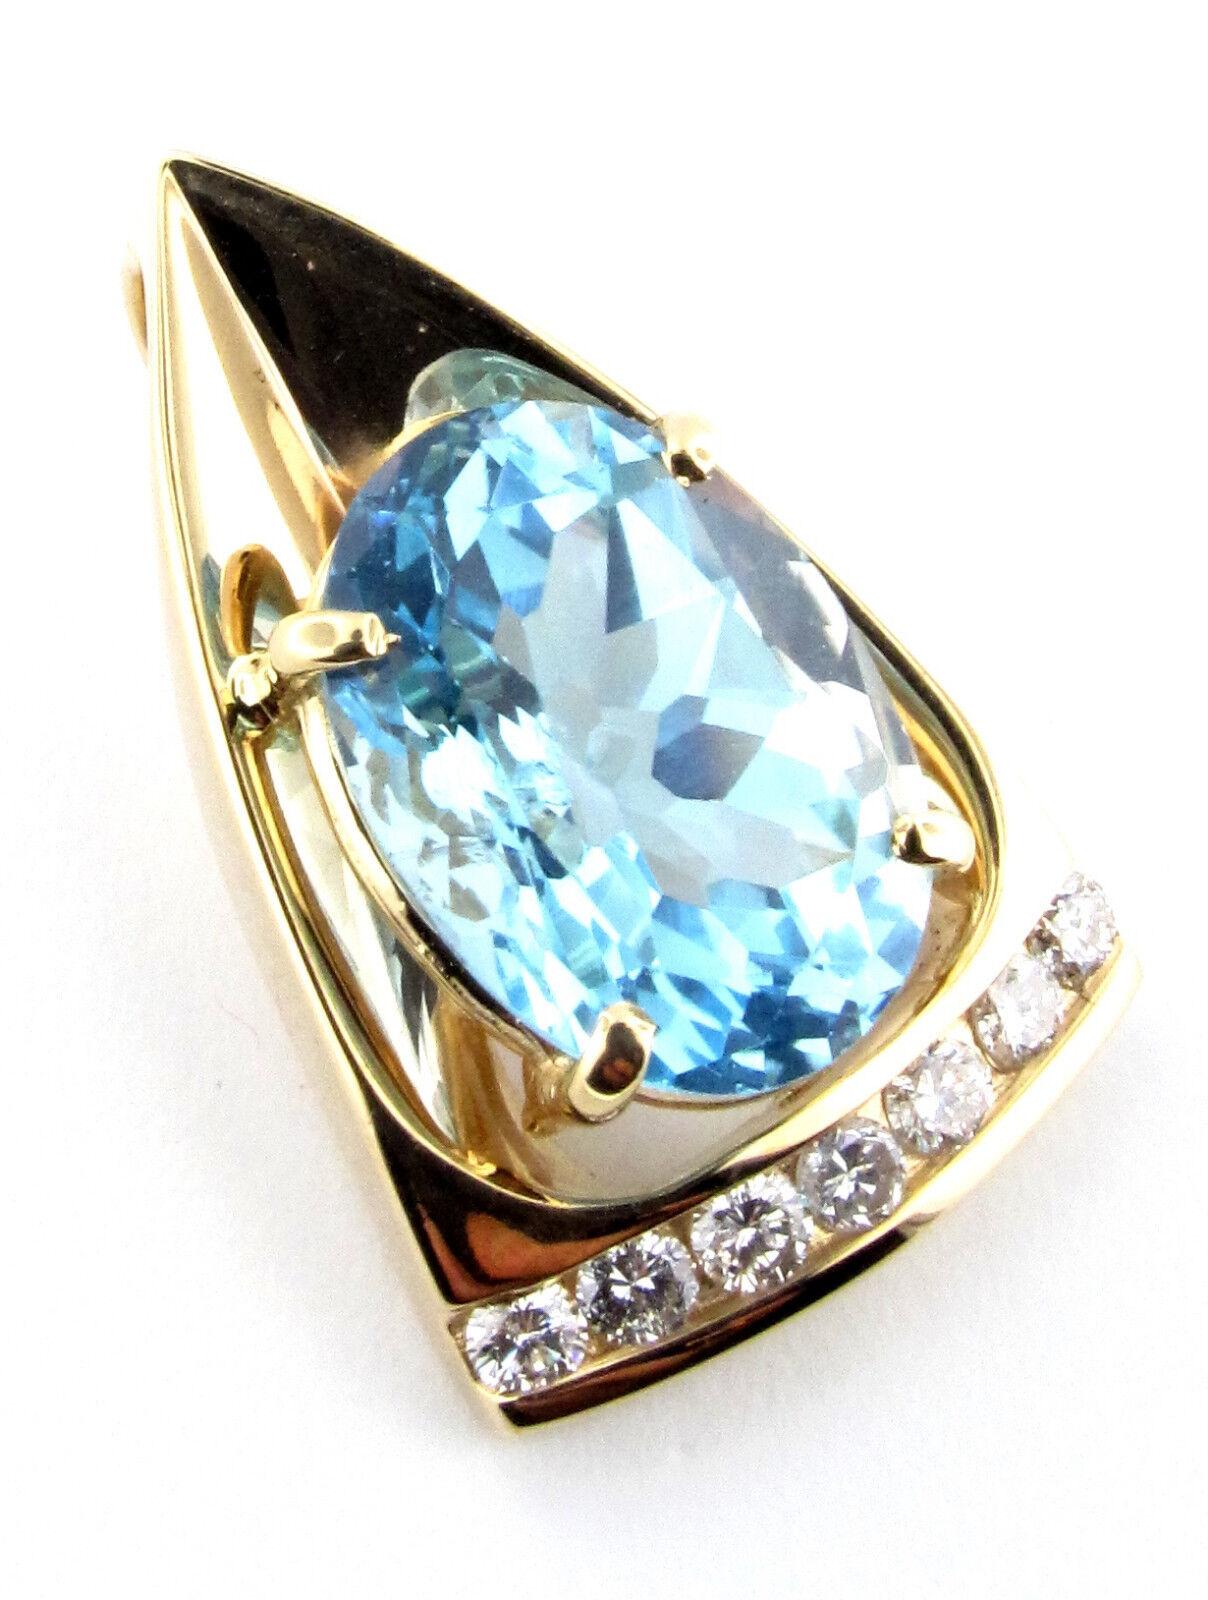 8.12 CTW LIGHT blueE OVAL TOPAZ & DIAMOND PENDANT 14 KT YELLOW gold 1  TALL  3100